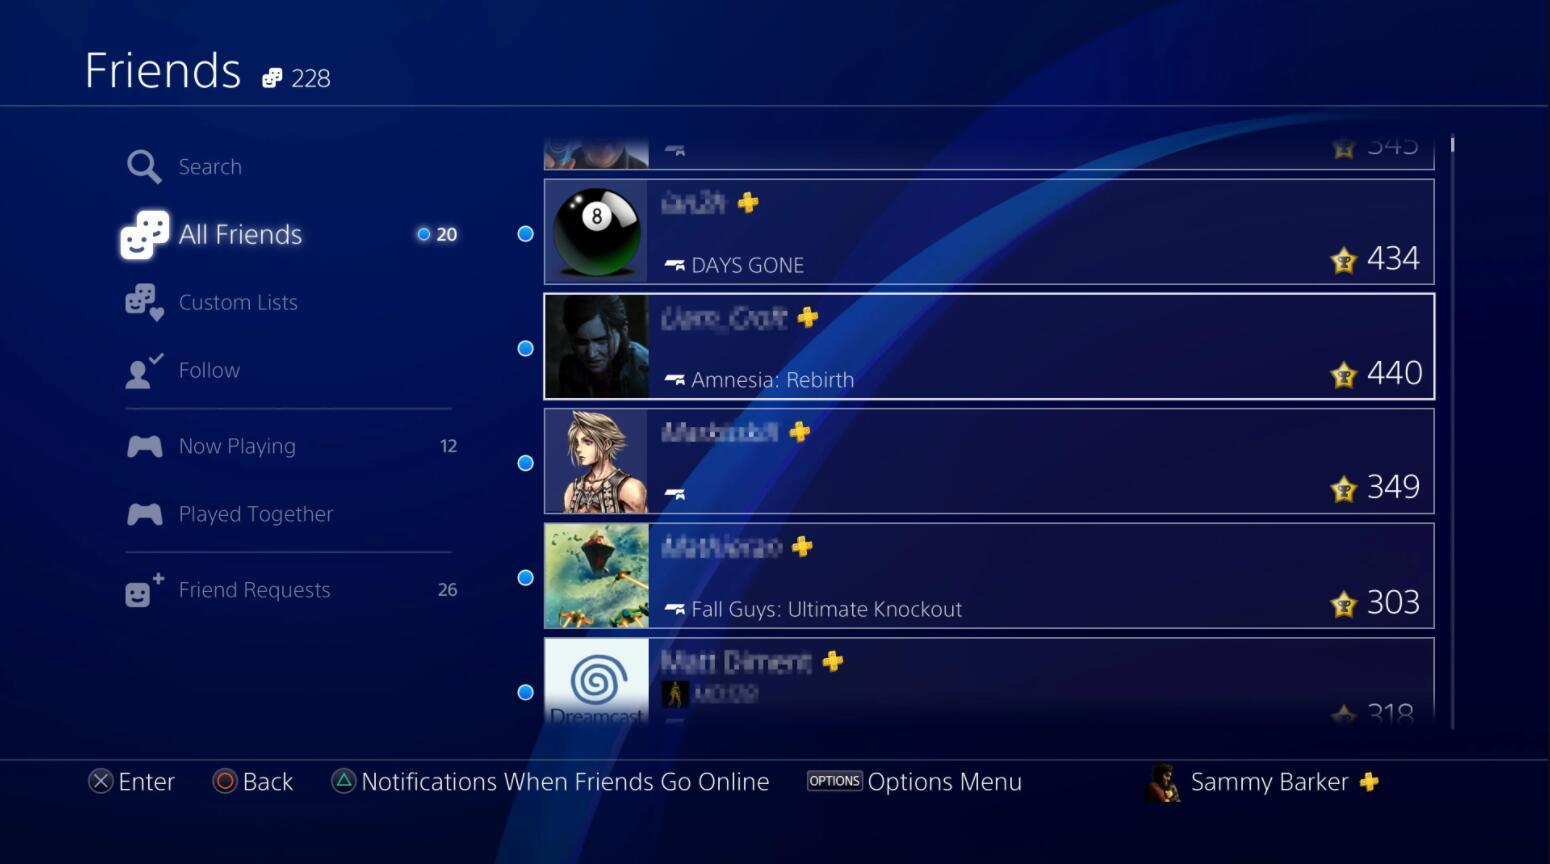 PS4好友列表现在会显示对方用的是哪款主机